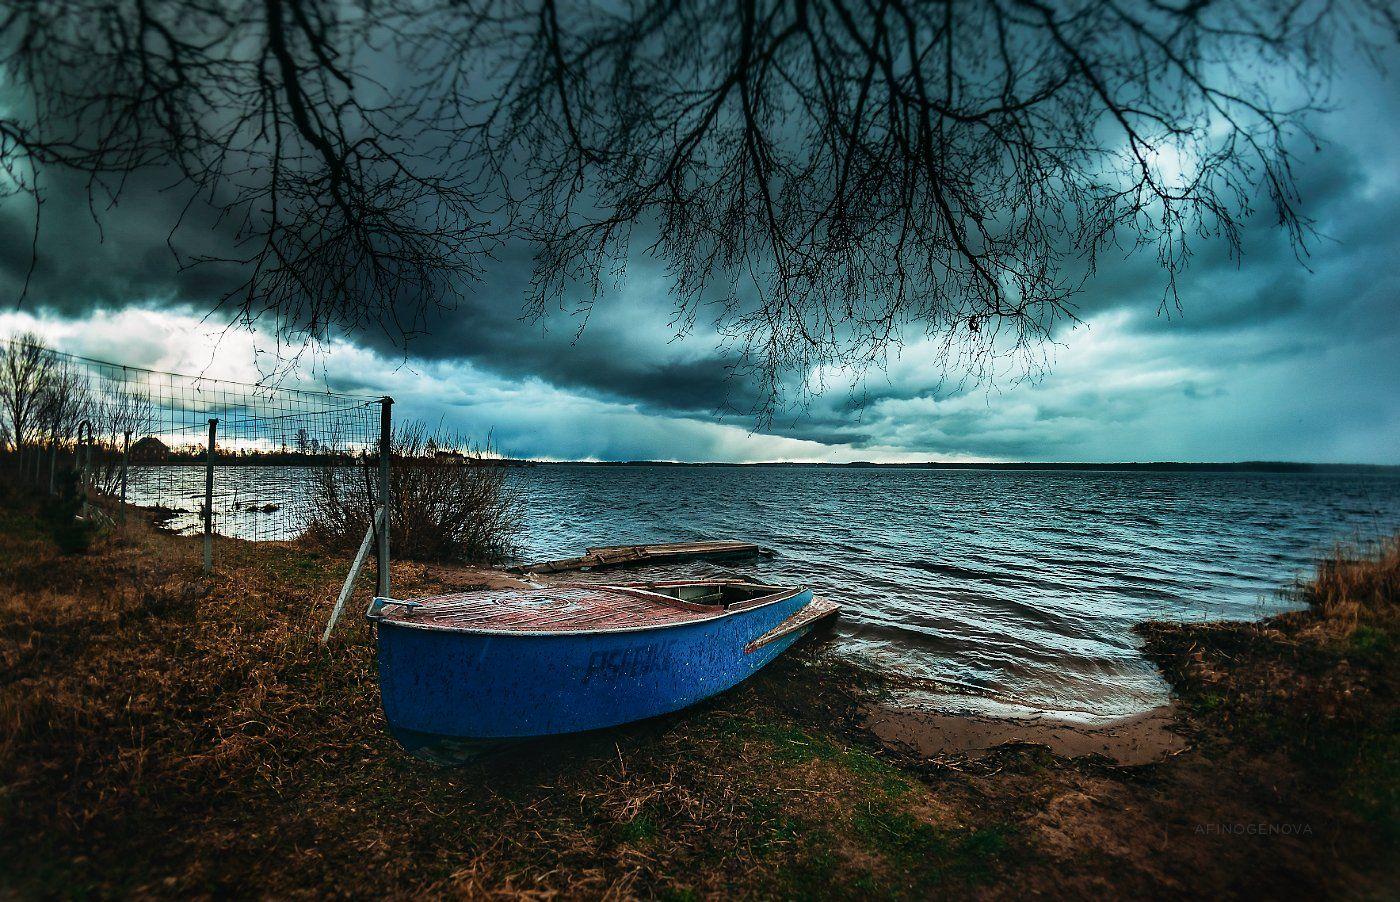 берег, тучи, лодка, вода, трава, березы, облака, дождь, ветер, весна, Афиногенова Татьяна